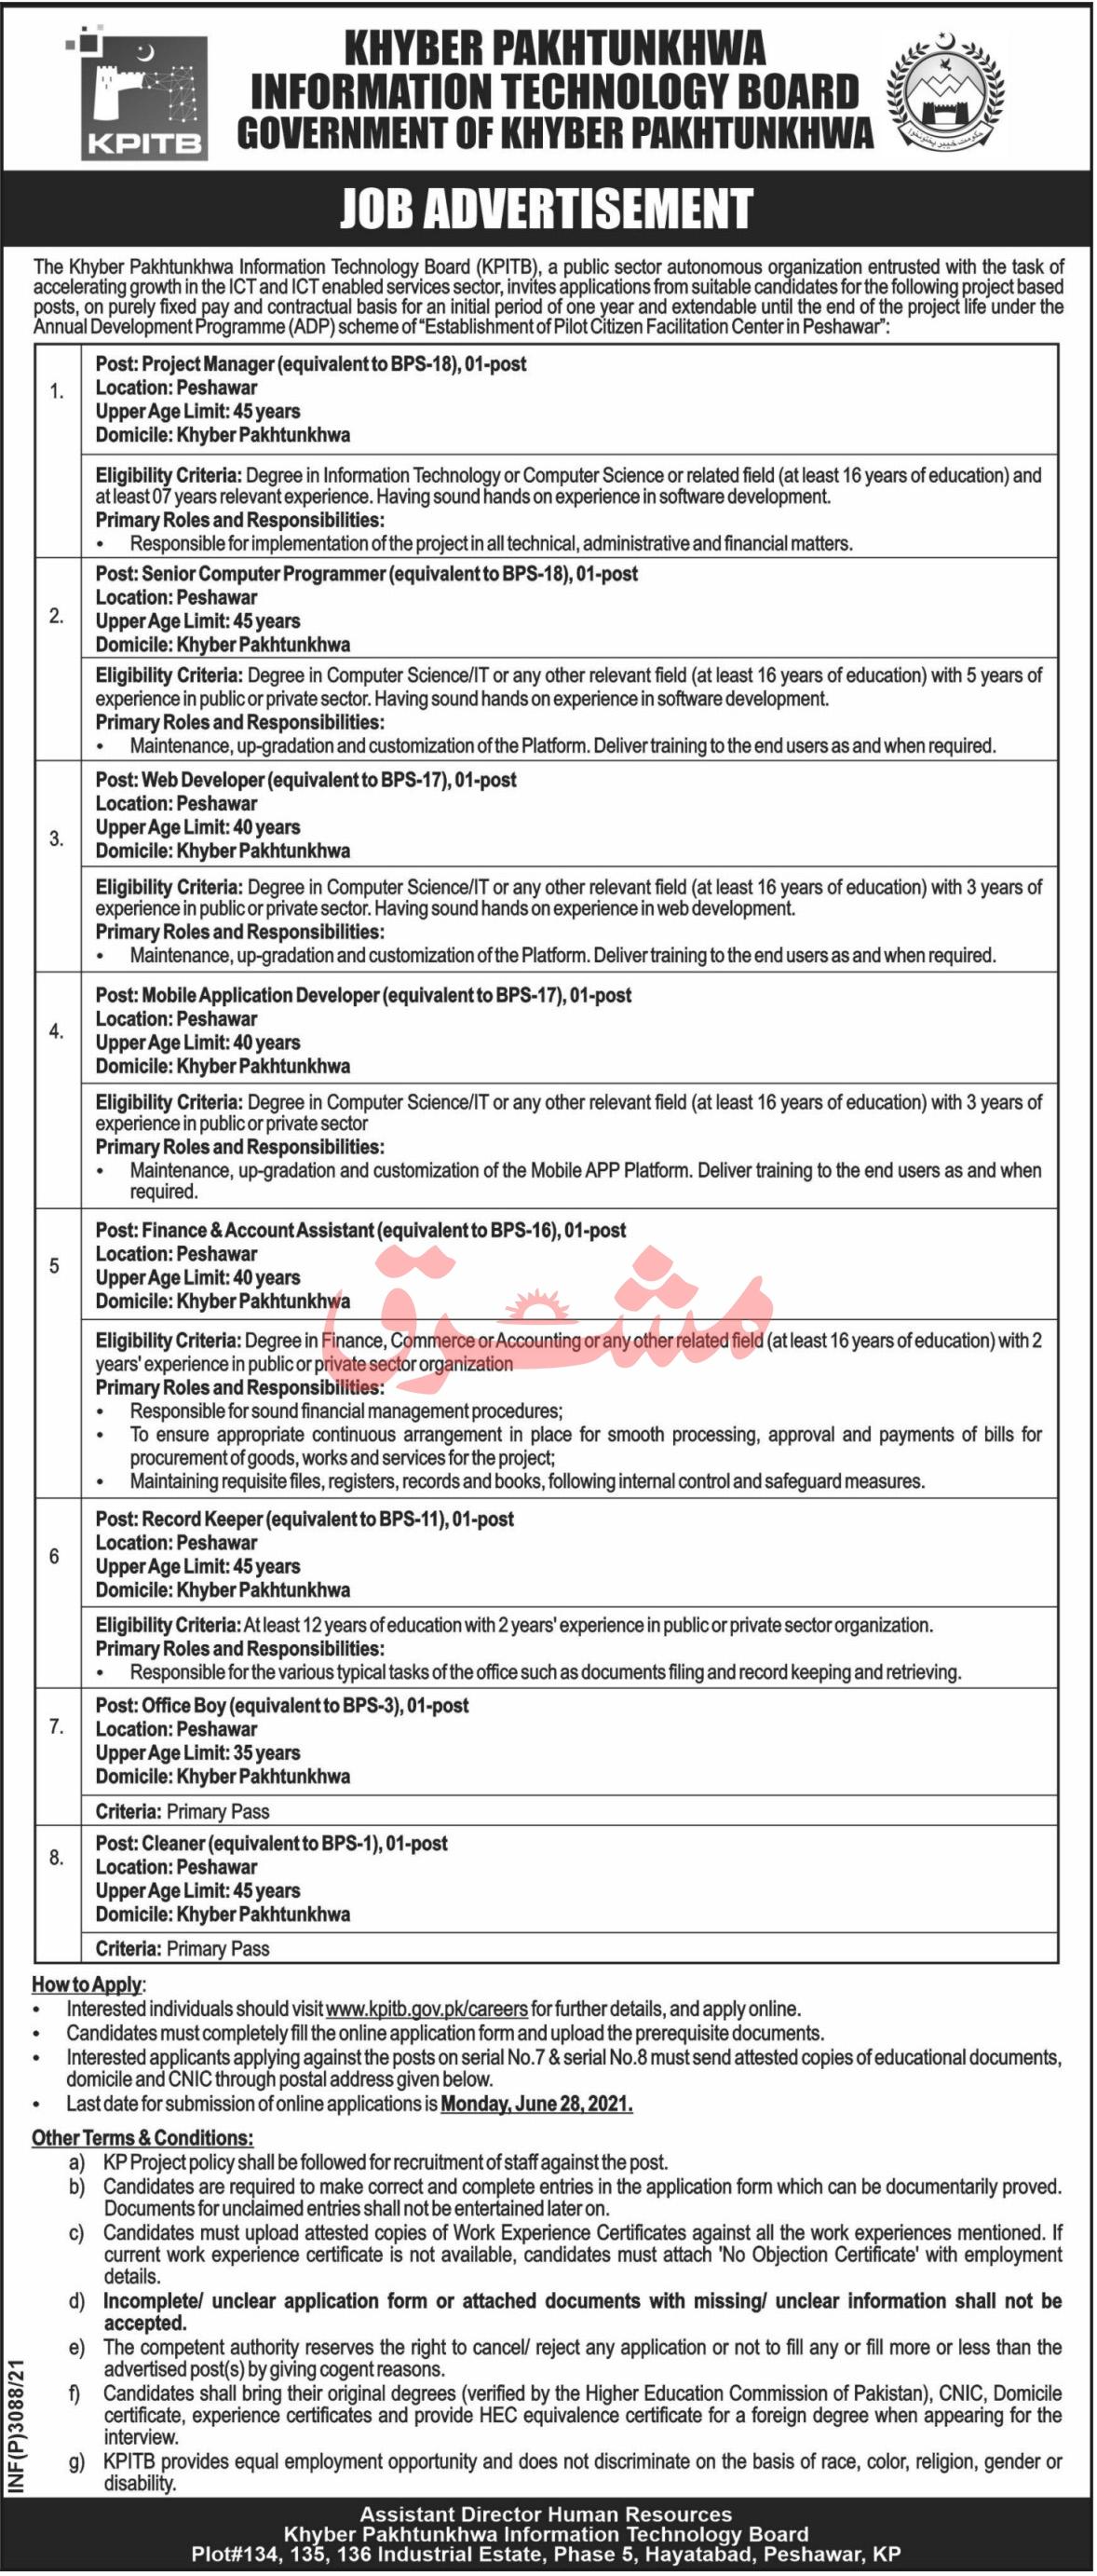 Khyber Pakhtunkhwa Information Technology Board Jobs